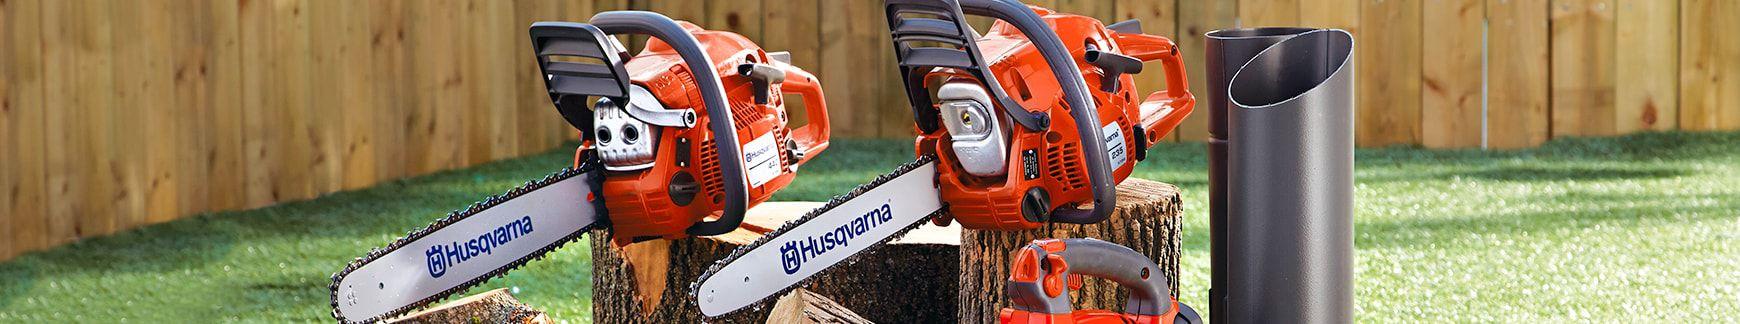 Husqvarna Power Equipment | Canadian Tire